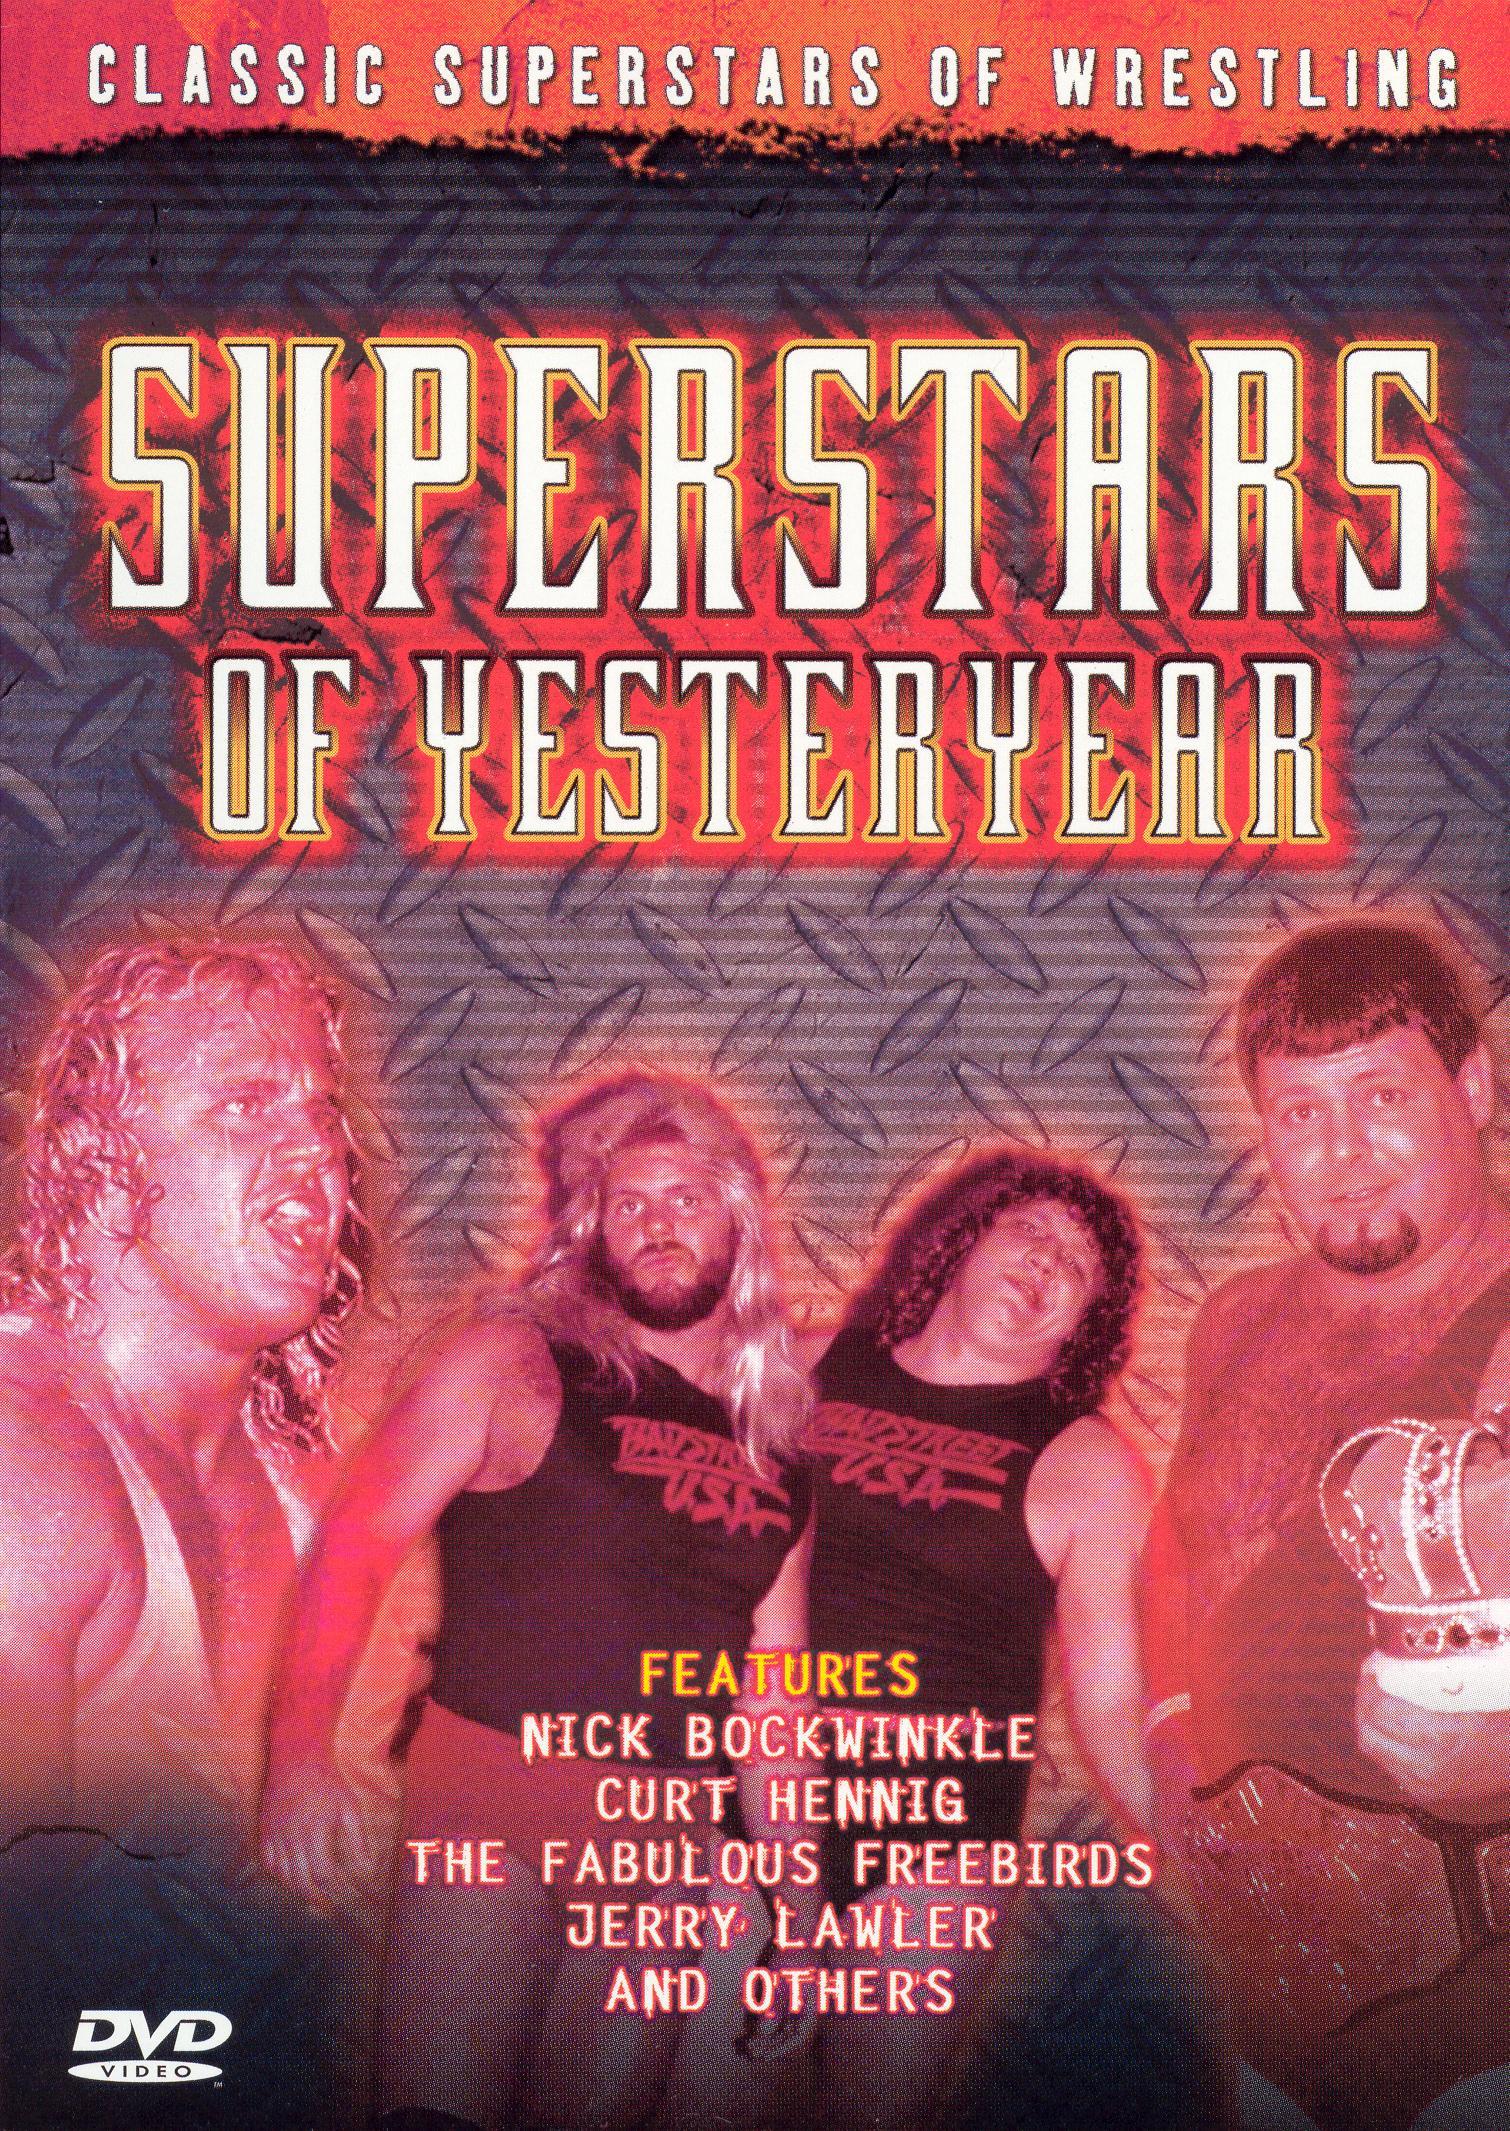 Classic Superstars of Wrestling: Superstars of Yesteryear